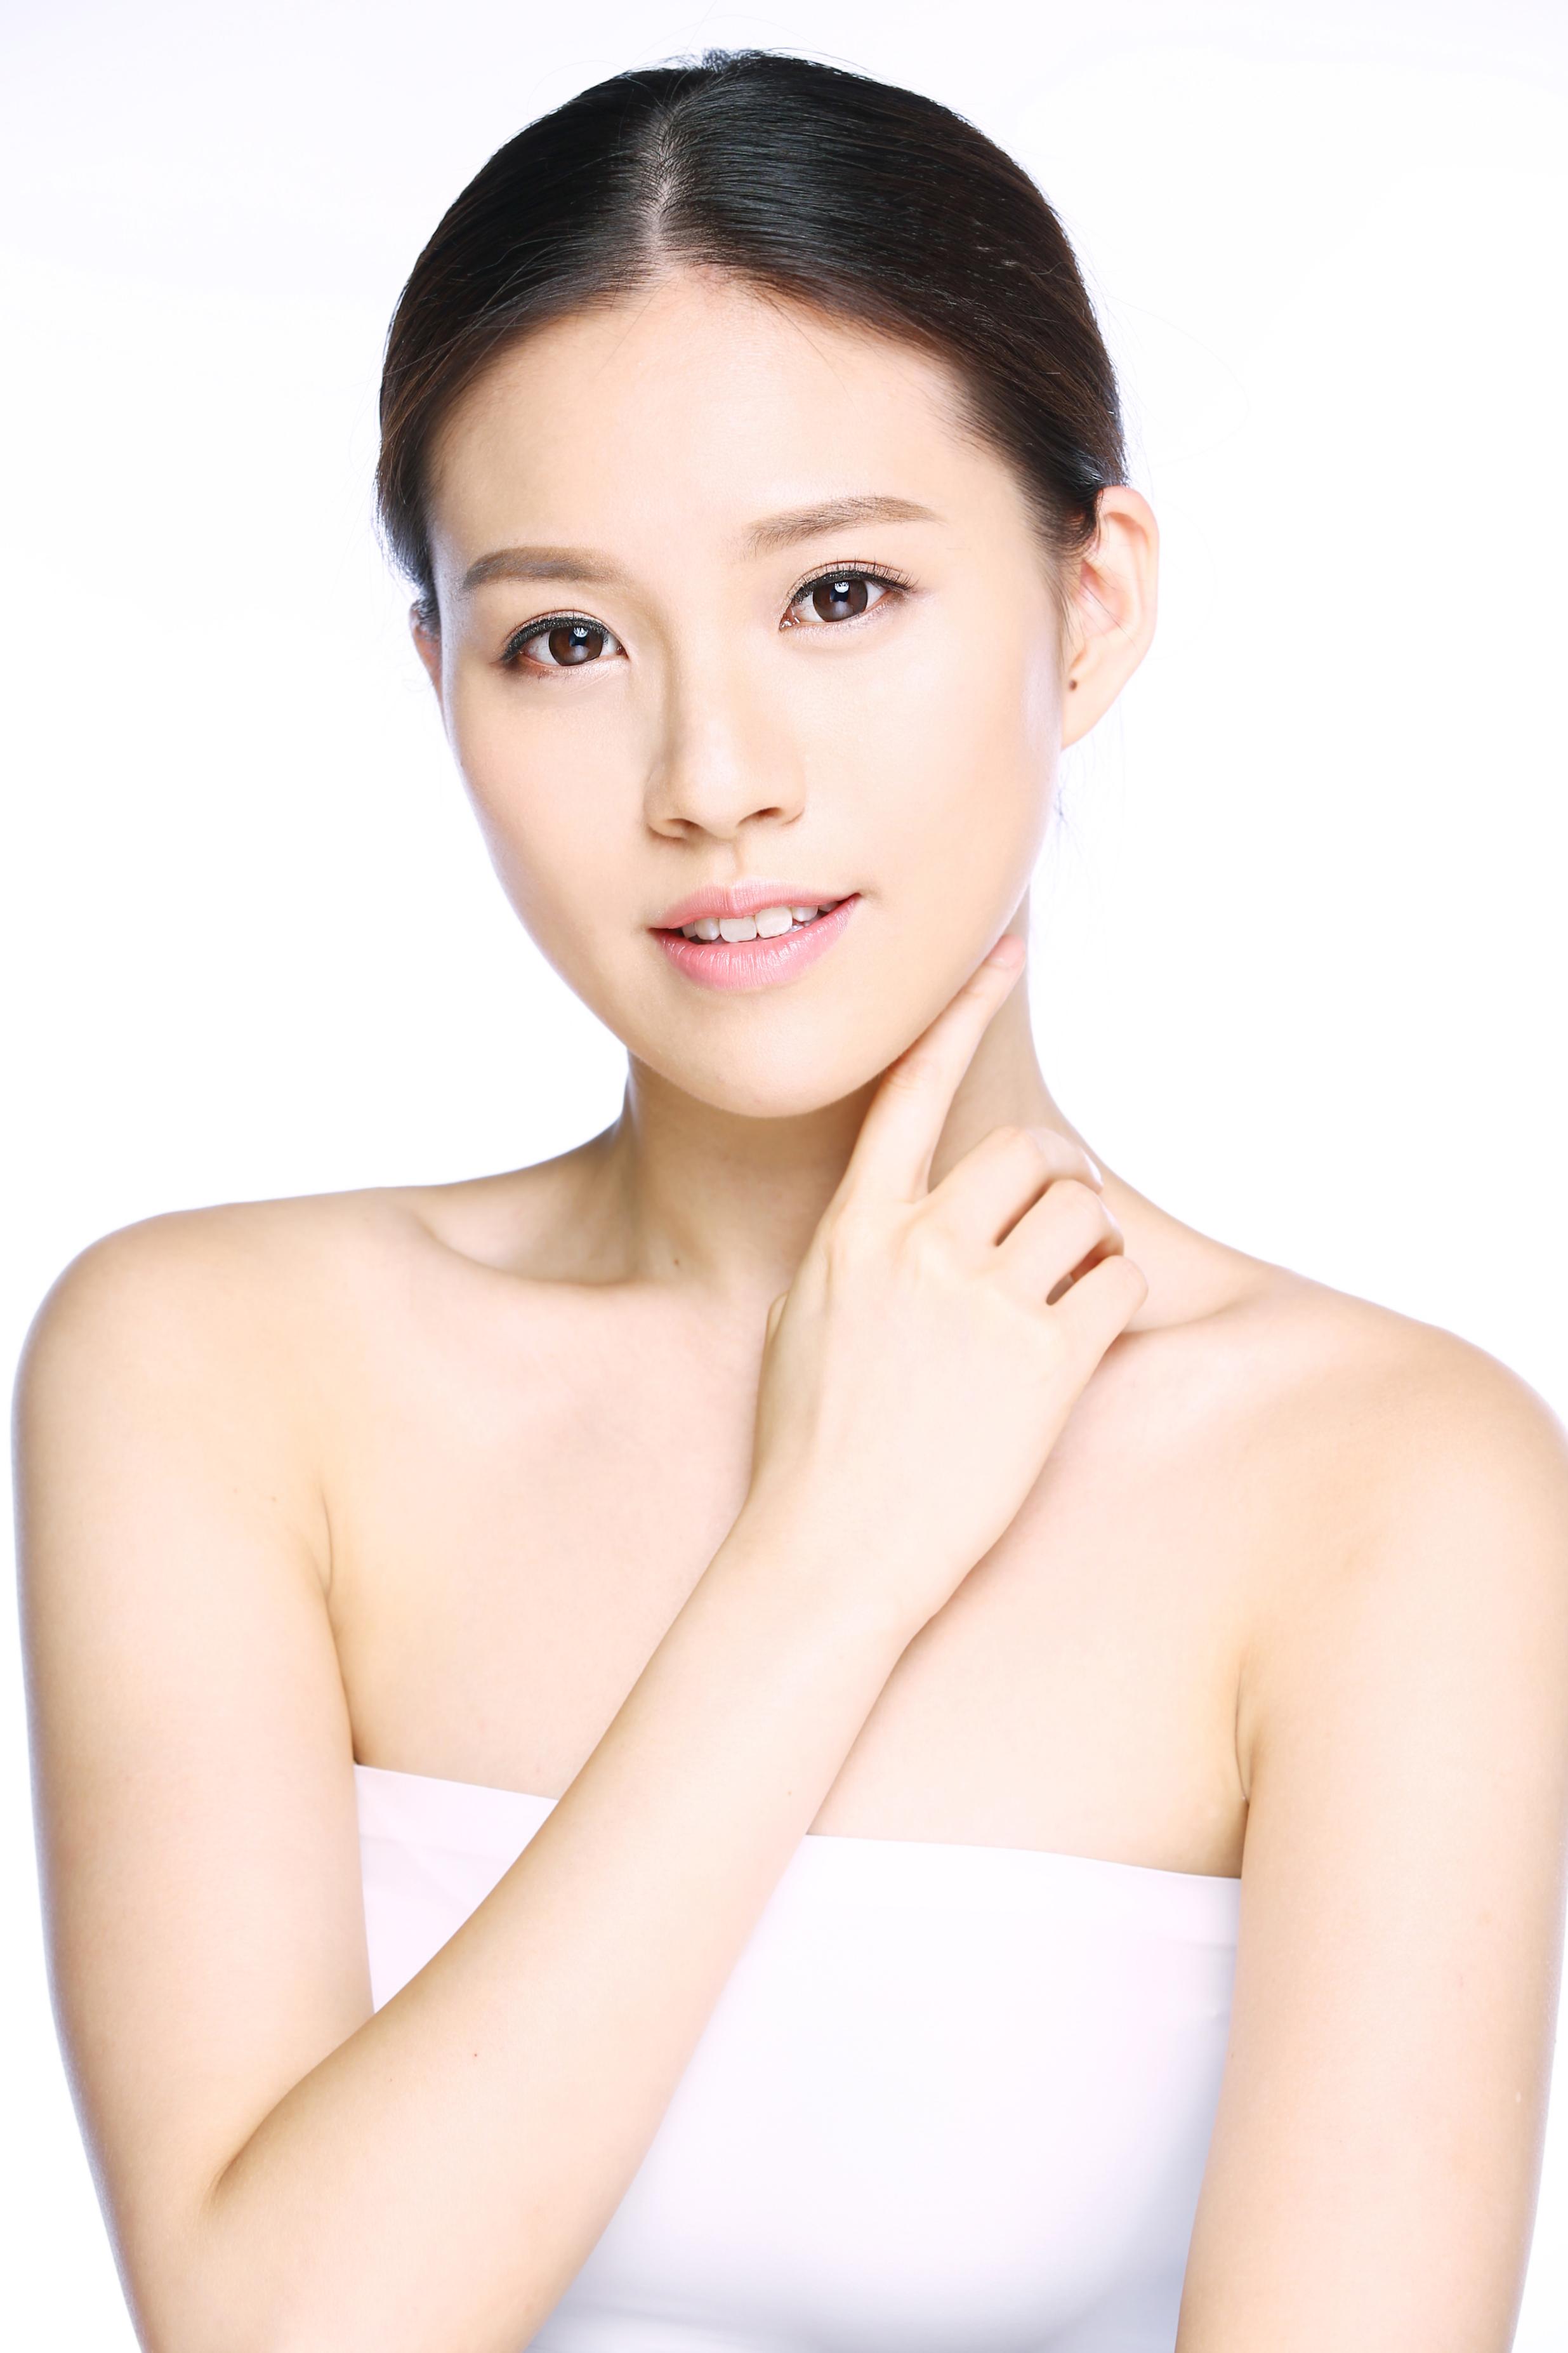 Model Factory Hong Kong Female Model MelodyK